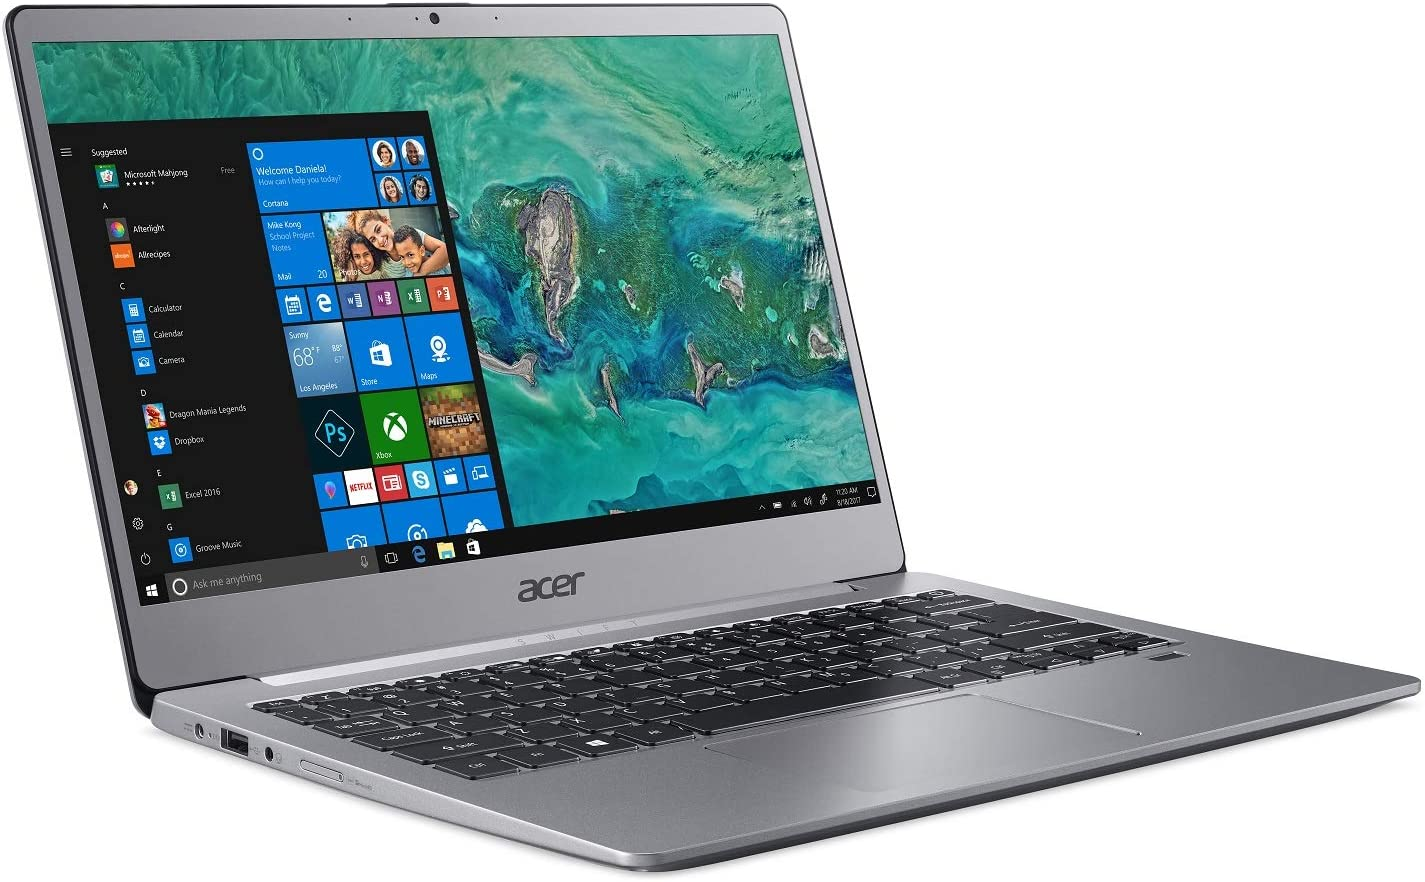 "Acer Swift 3 SF313-51-57EQ Laptop, 14"" Full HD, 8th Gen Intel Core i5-8250U, 8GB DDR4, 256GB PCIe SSD, Back-lit Keyboard, Windows 10"